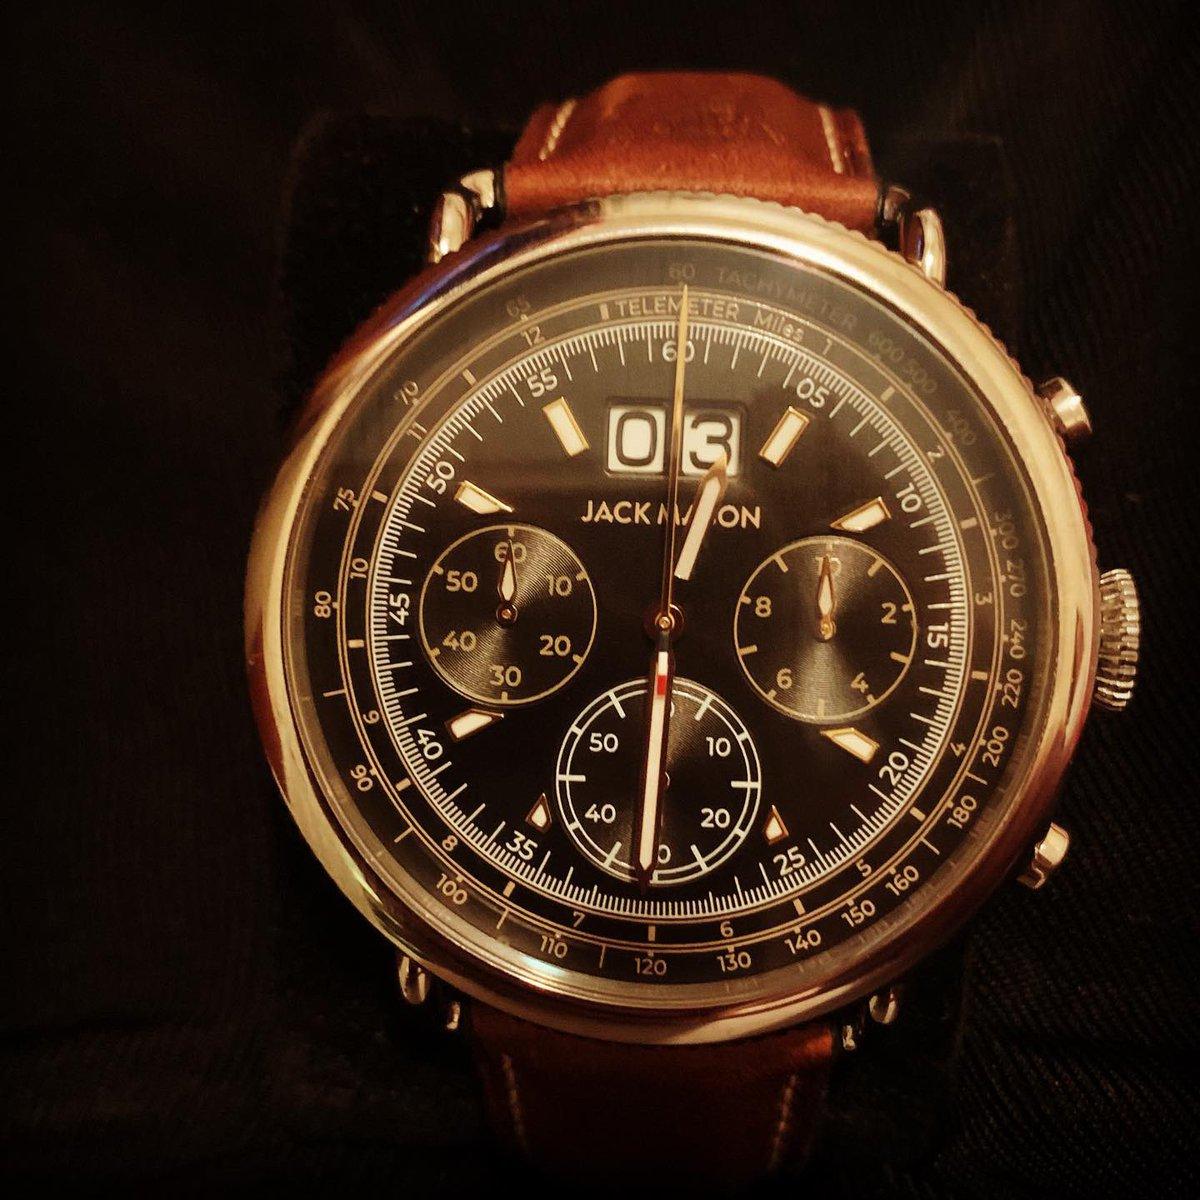 #myjackmason #jackmason #jackmasonbrand #wristgame #wristwatch #watchphotography #watch #watches #watchoftheday #wristbangboom #watchbangboom #menswatch #horology #watchlover #watchcommunity #wristshot #wristcheck #texaswatch #watchnerd #dailywatch #microbrandwatch #Aviationwatch